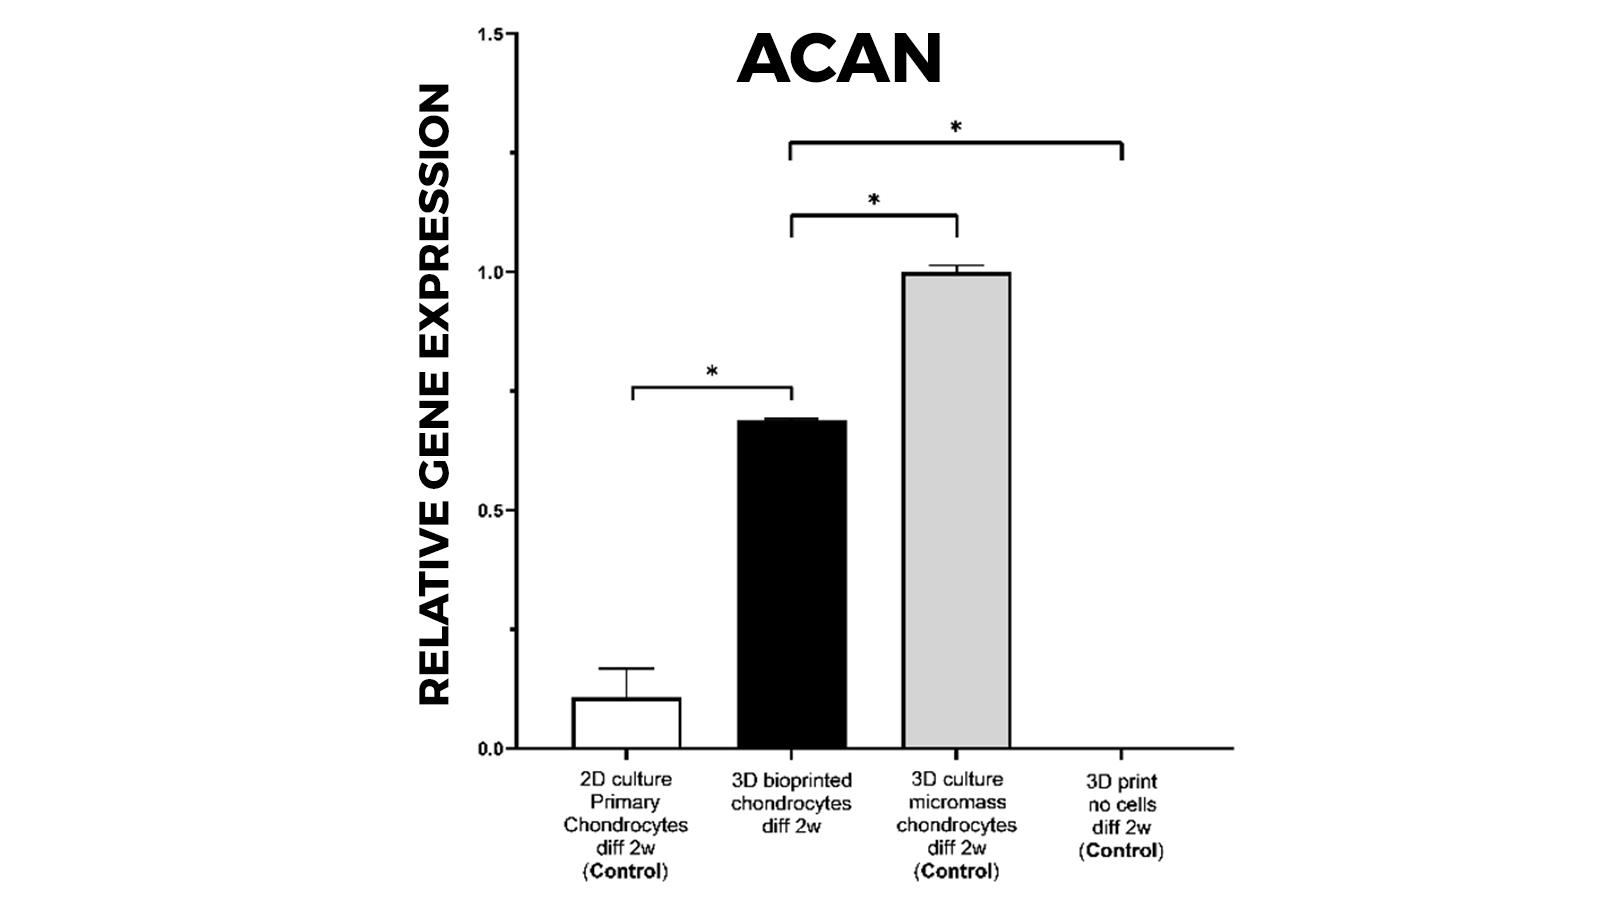 3D promoting differentiation stem cells towards cartilage increased cartilage specific aggrecan (ACAN) mRNA expression 3D milieu compare 2D (Gatenholm et al., 2020). cópia